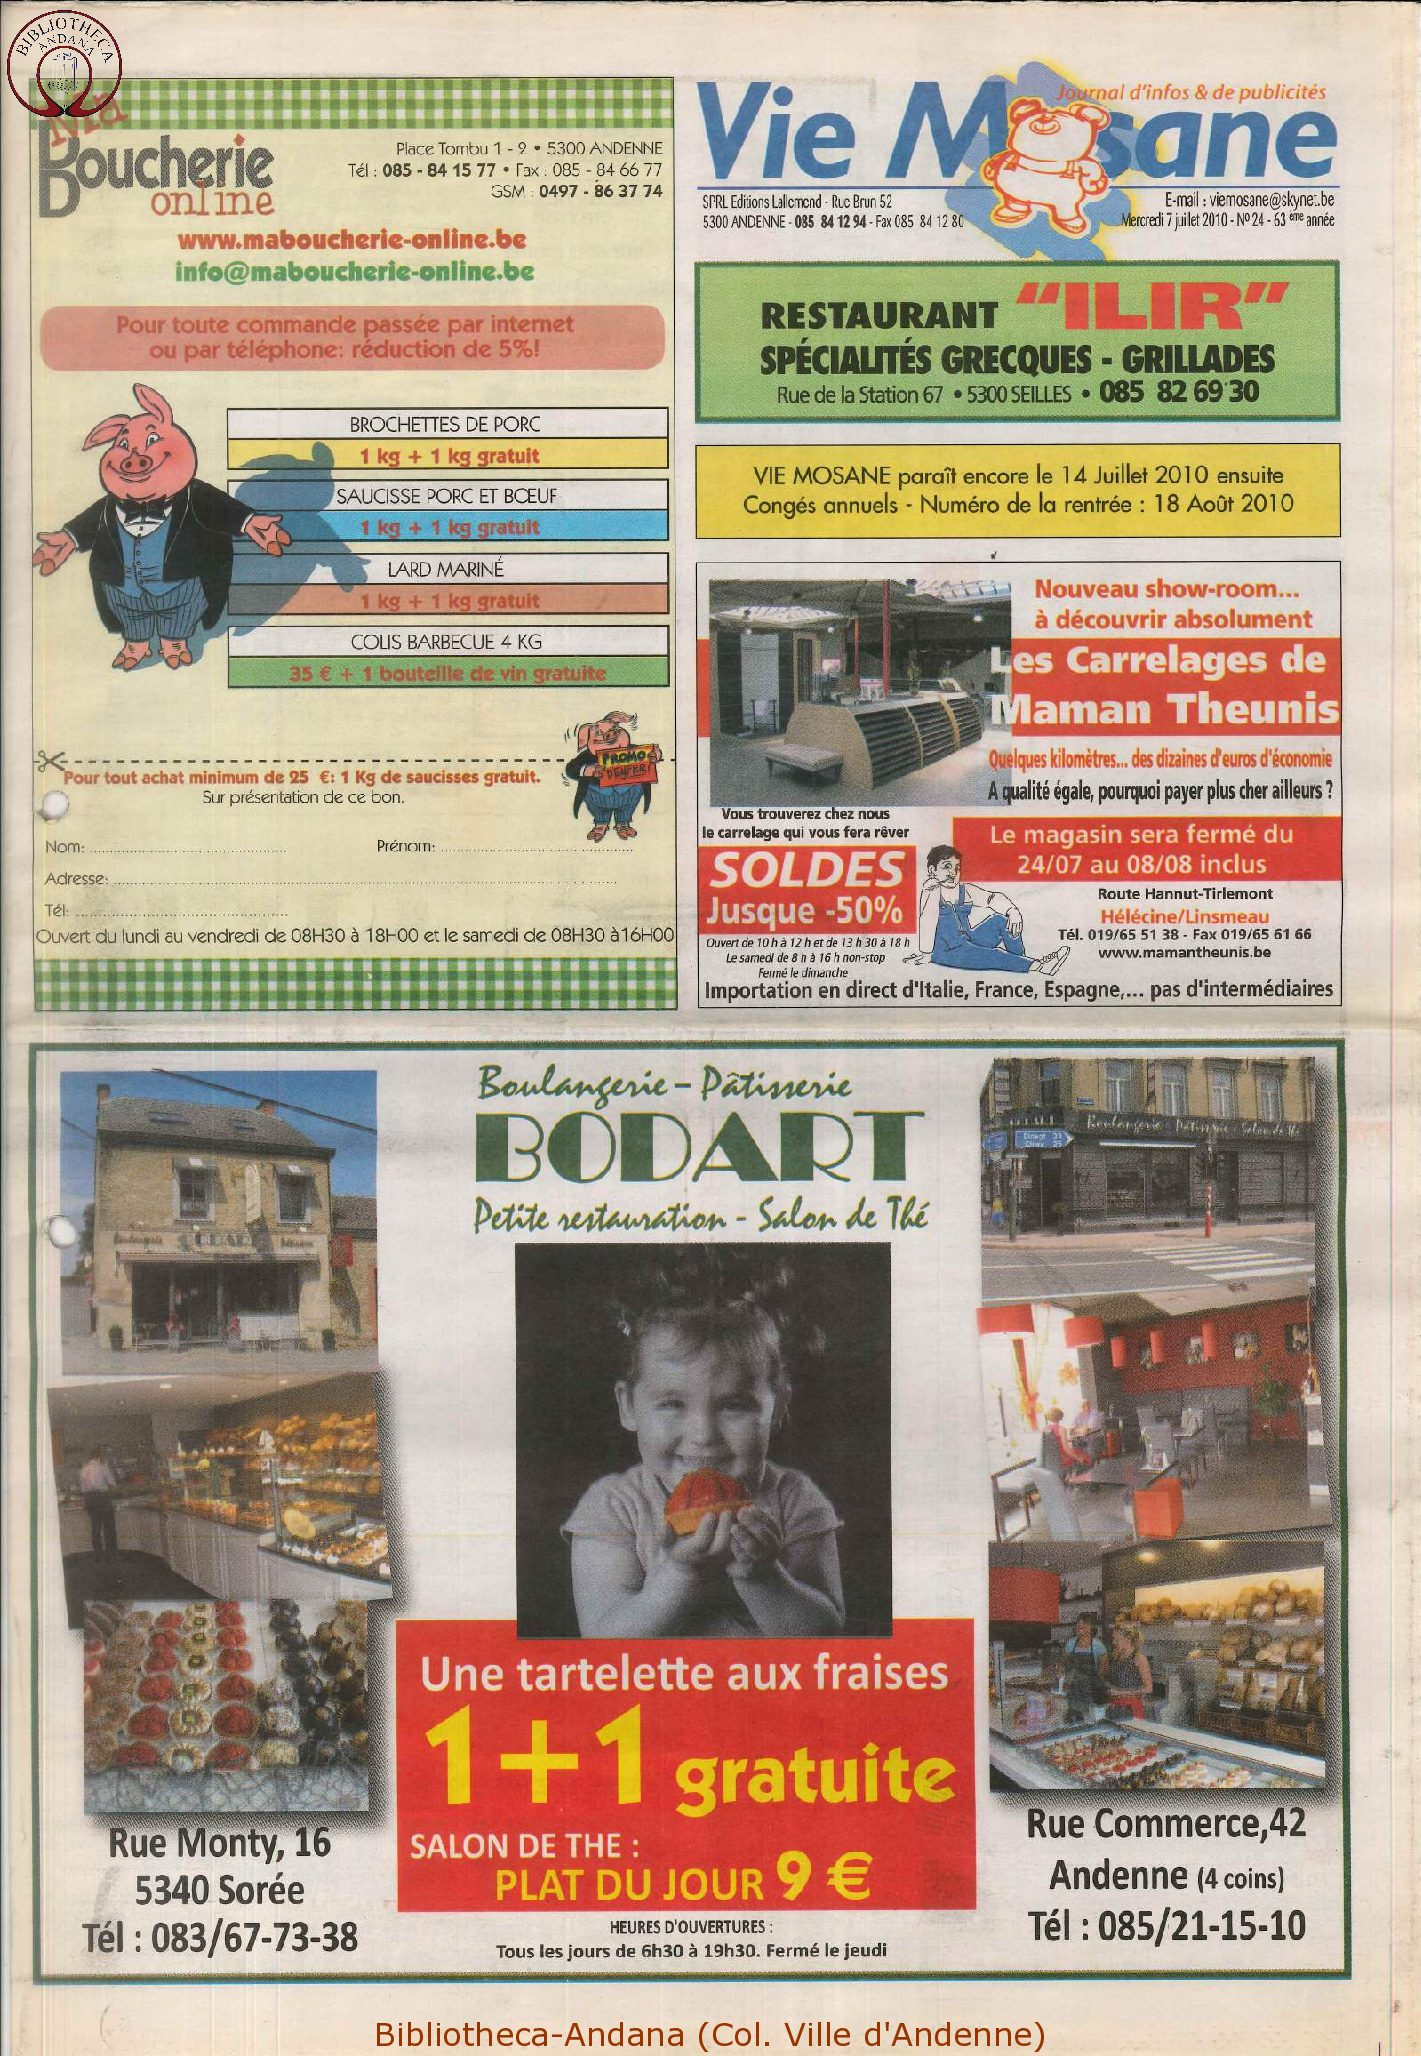 63e année - n°24 - 7 juillet 2010